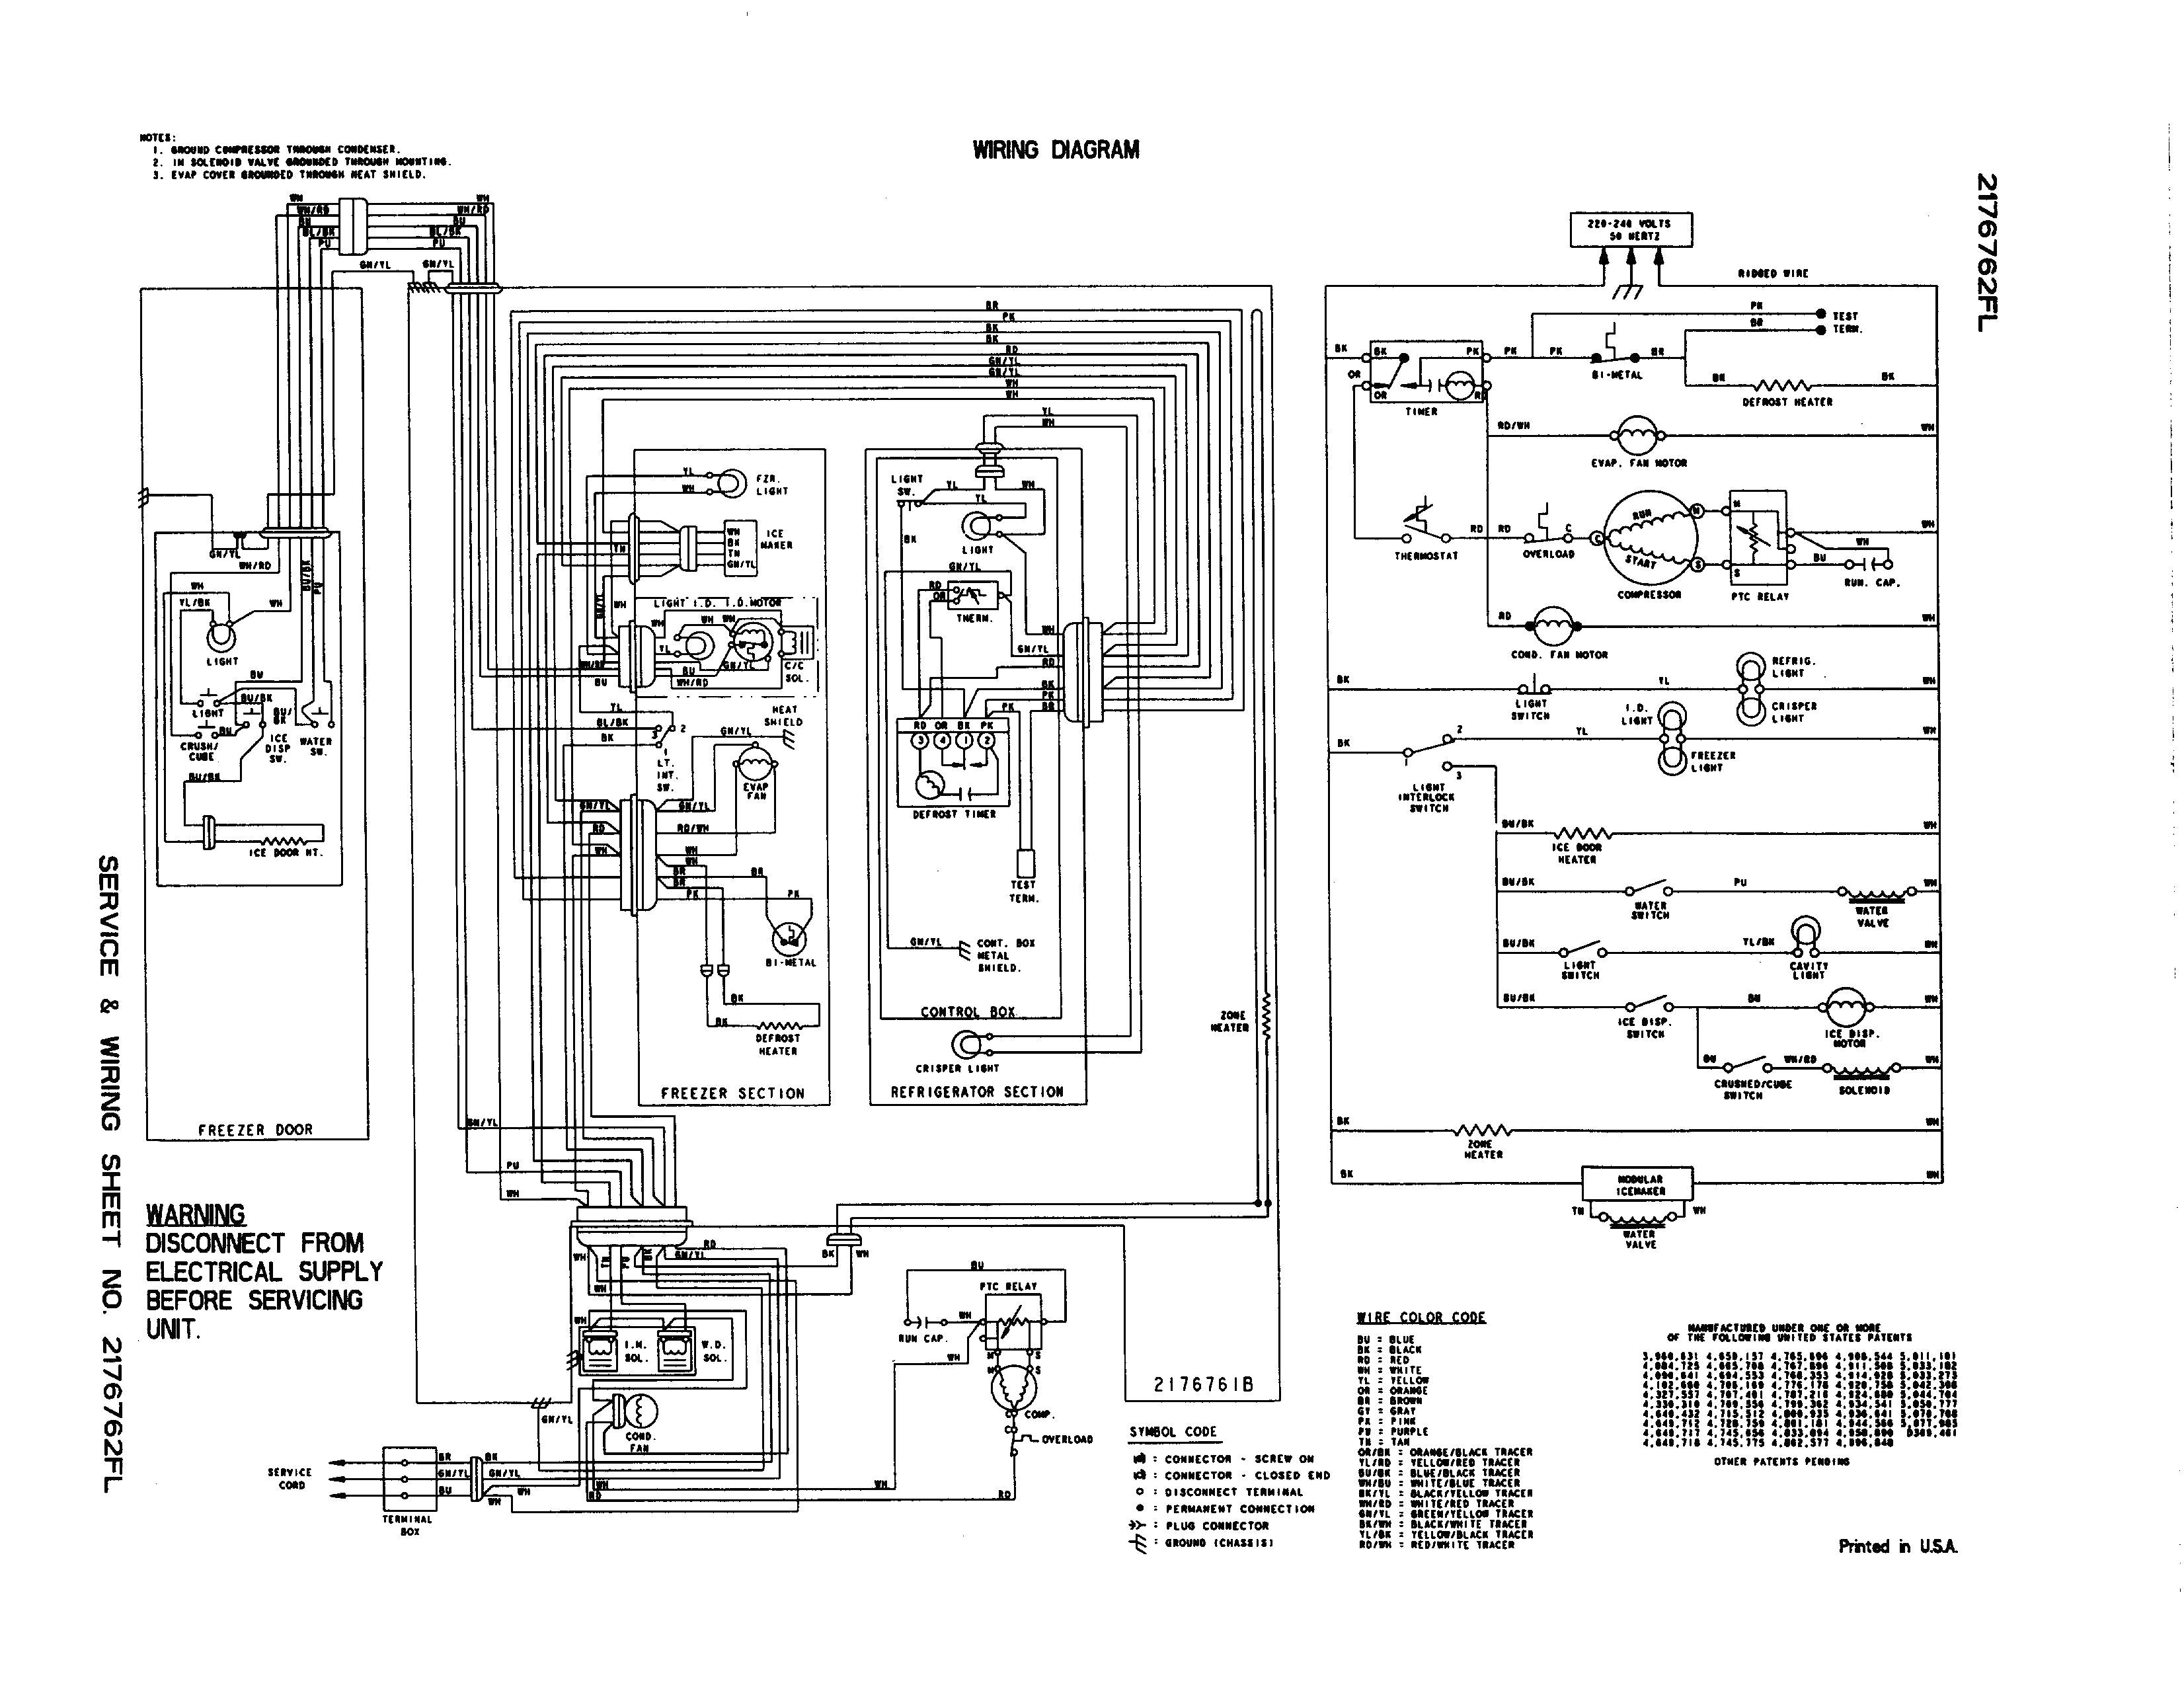 Diagram Kenmore Dryer Heating Element Diagram Kenmore Dryer Wiring